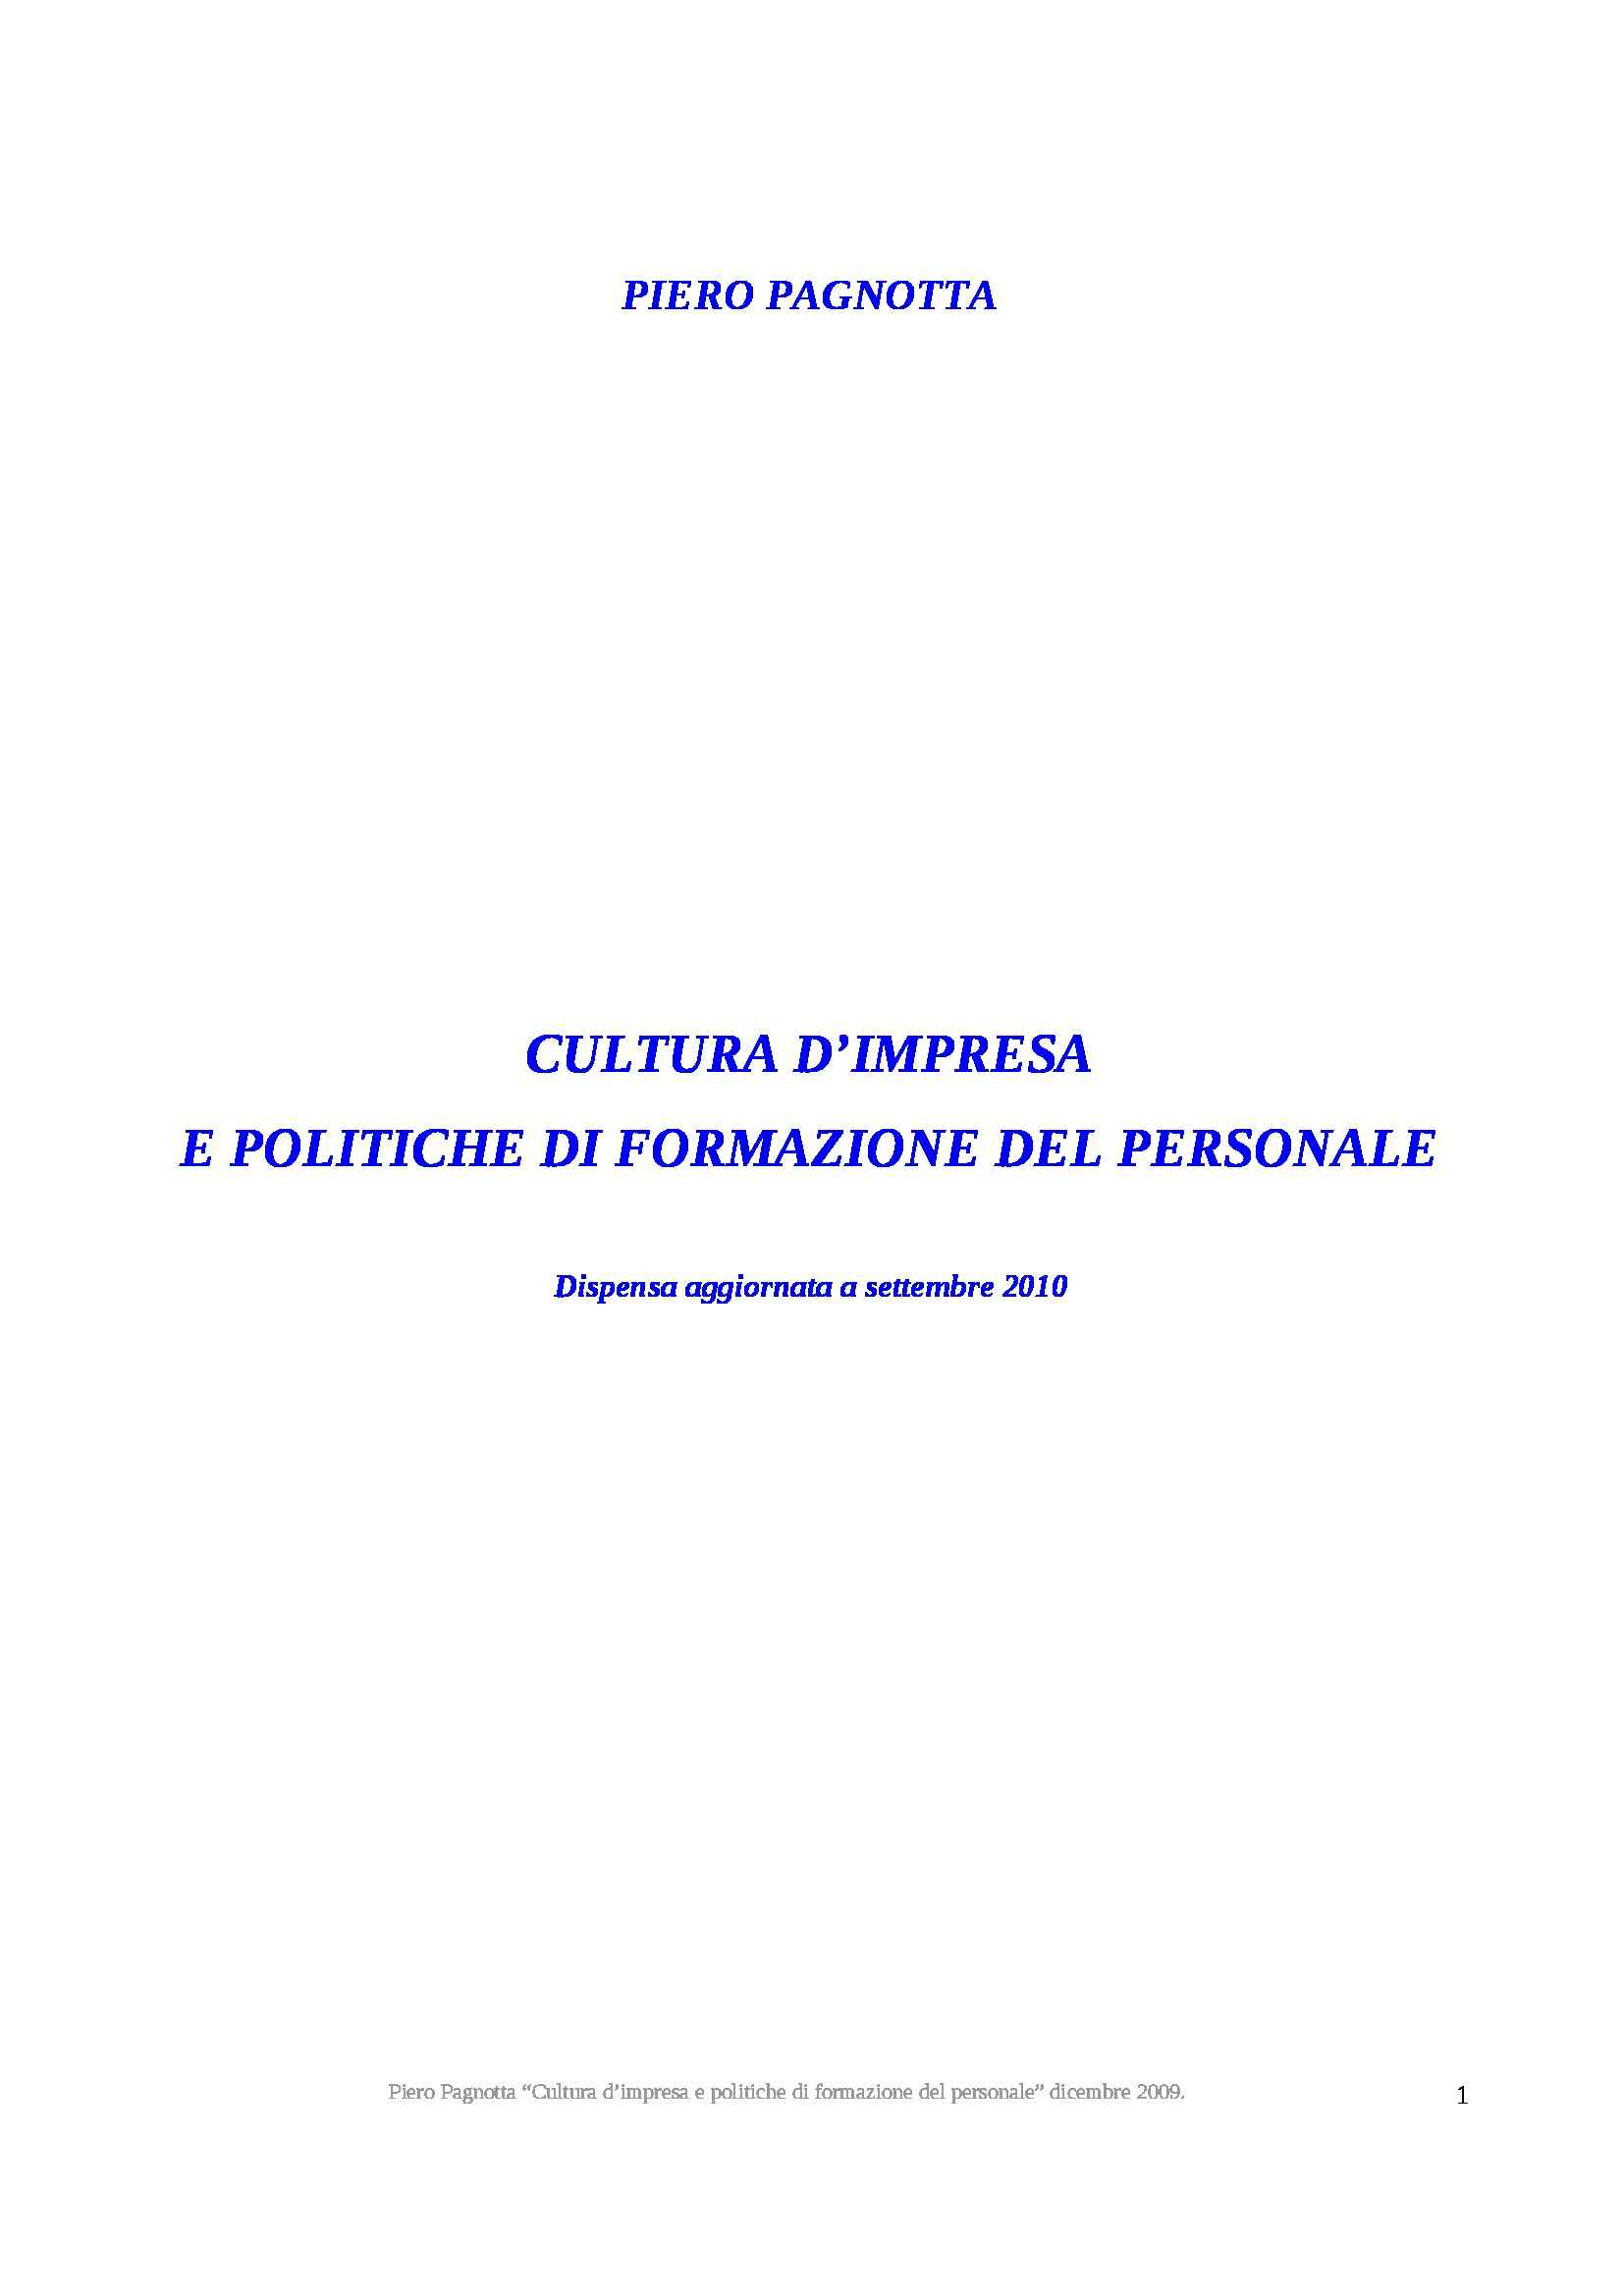 dispensa P. Pagnotta Filosofia del management